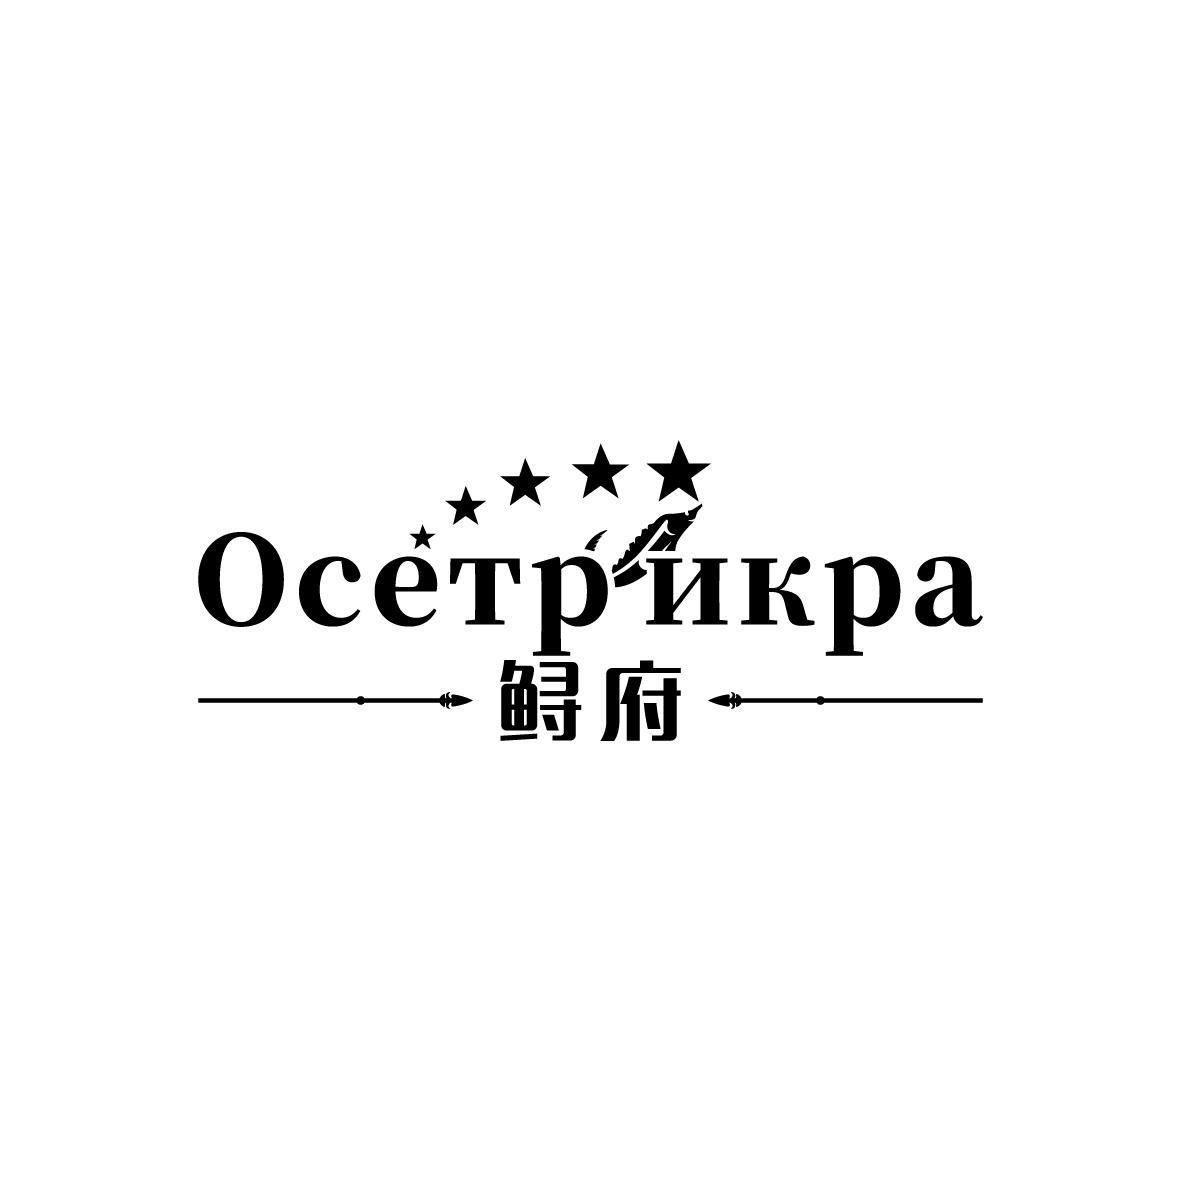 鲟府 OCETP NKPA